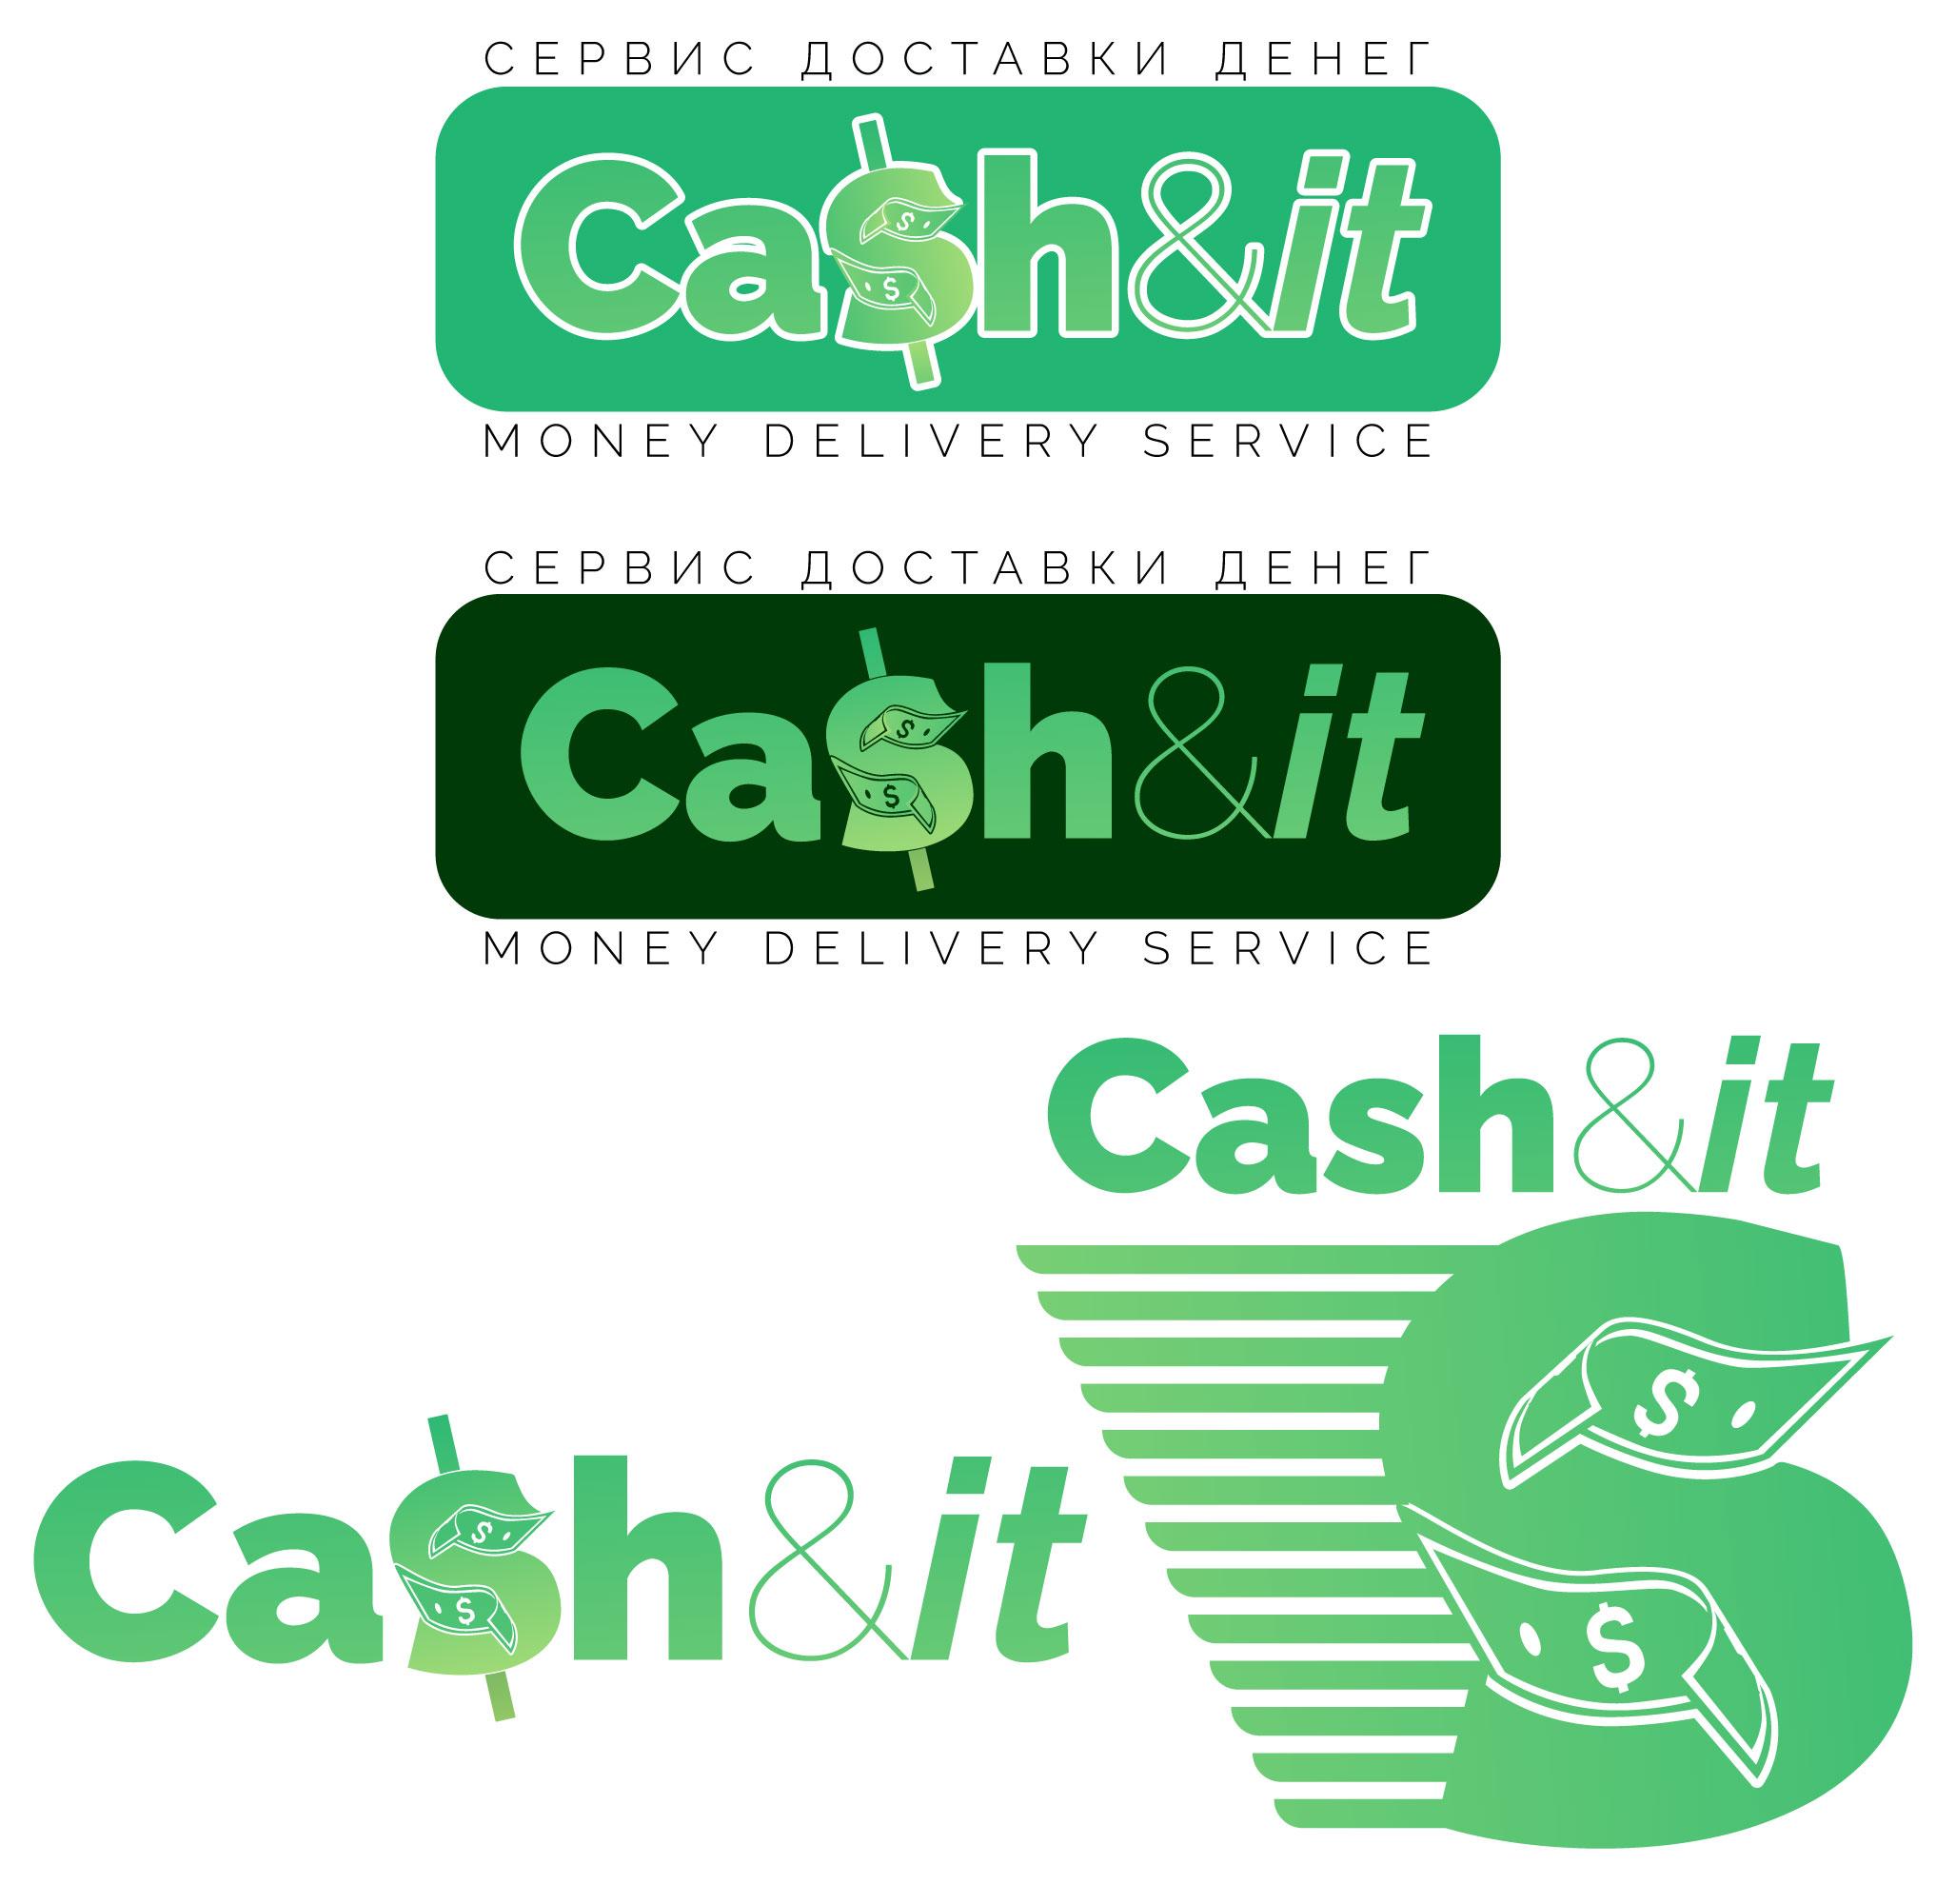 Логотип для Cash & IT - сервис доставки денег фото f_5225fdcf0bbde816.jpg